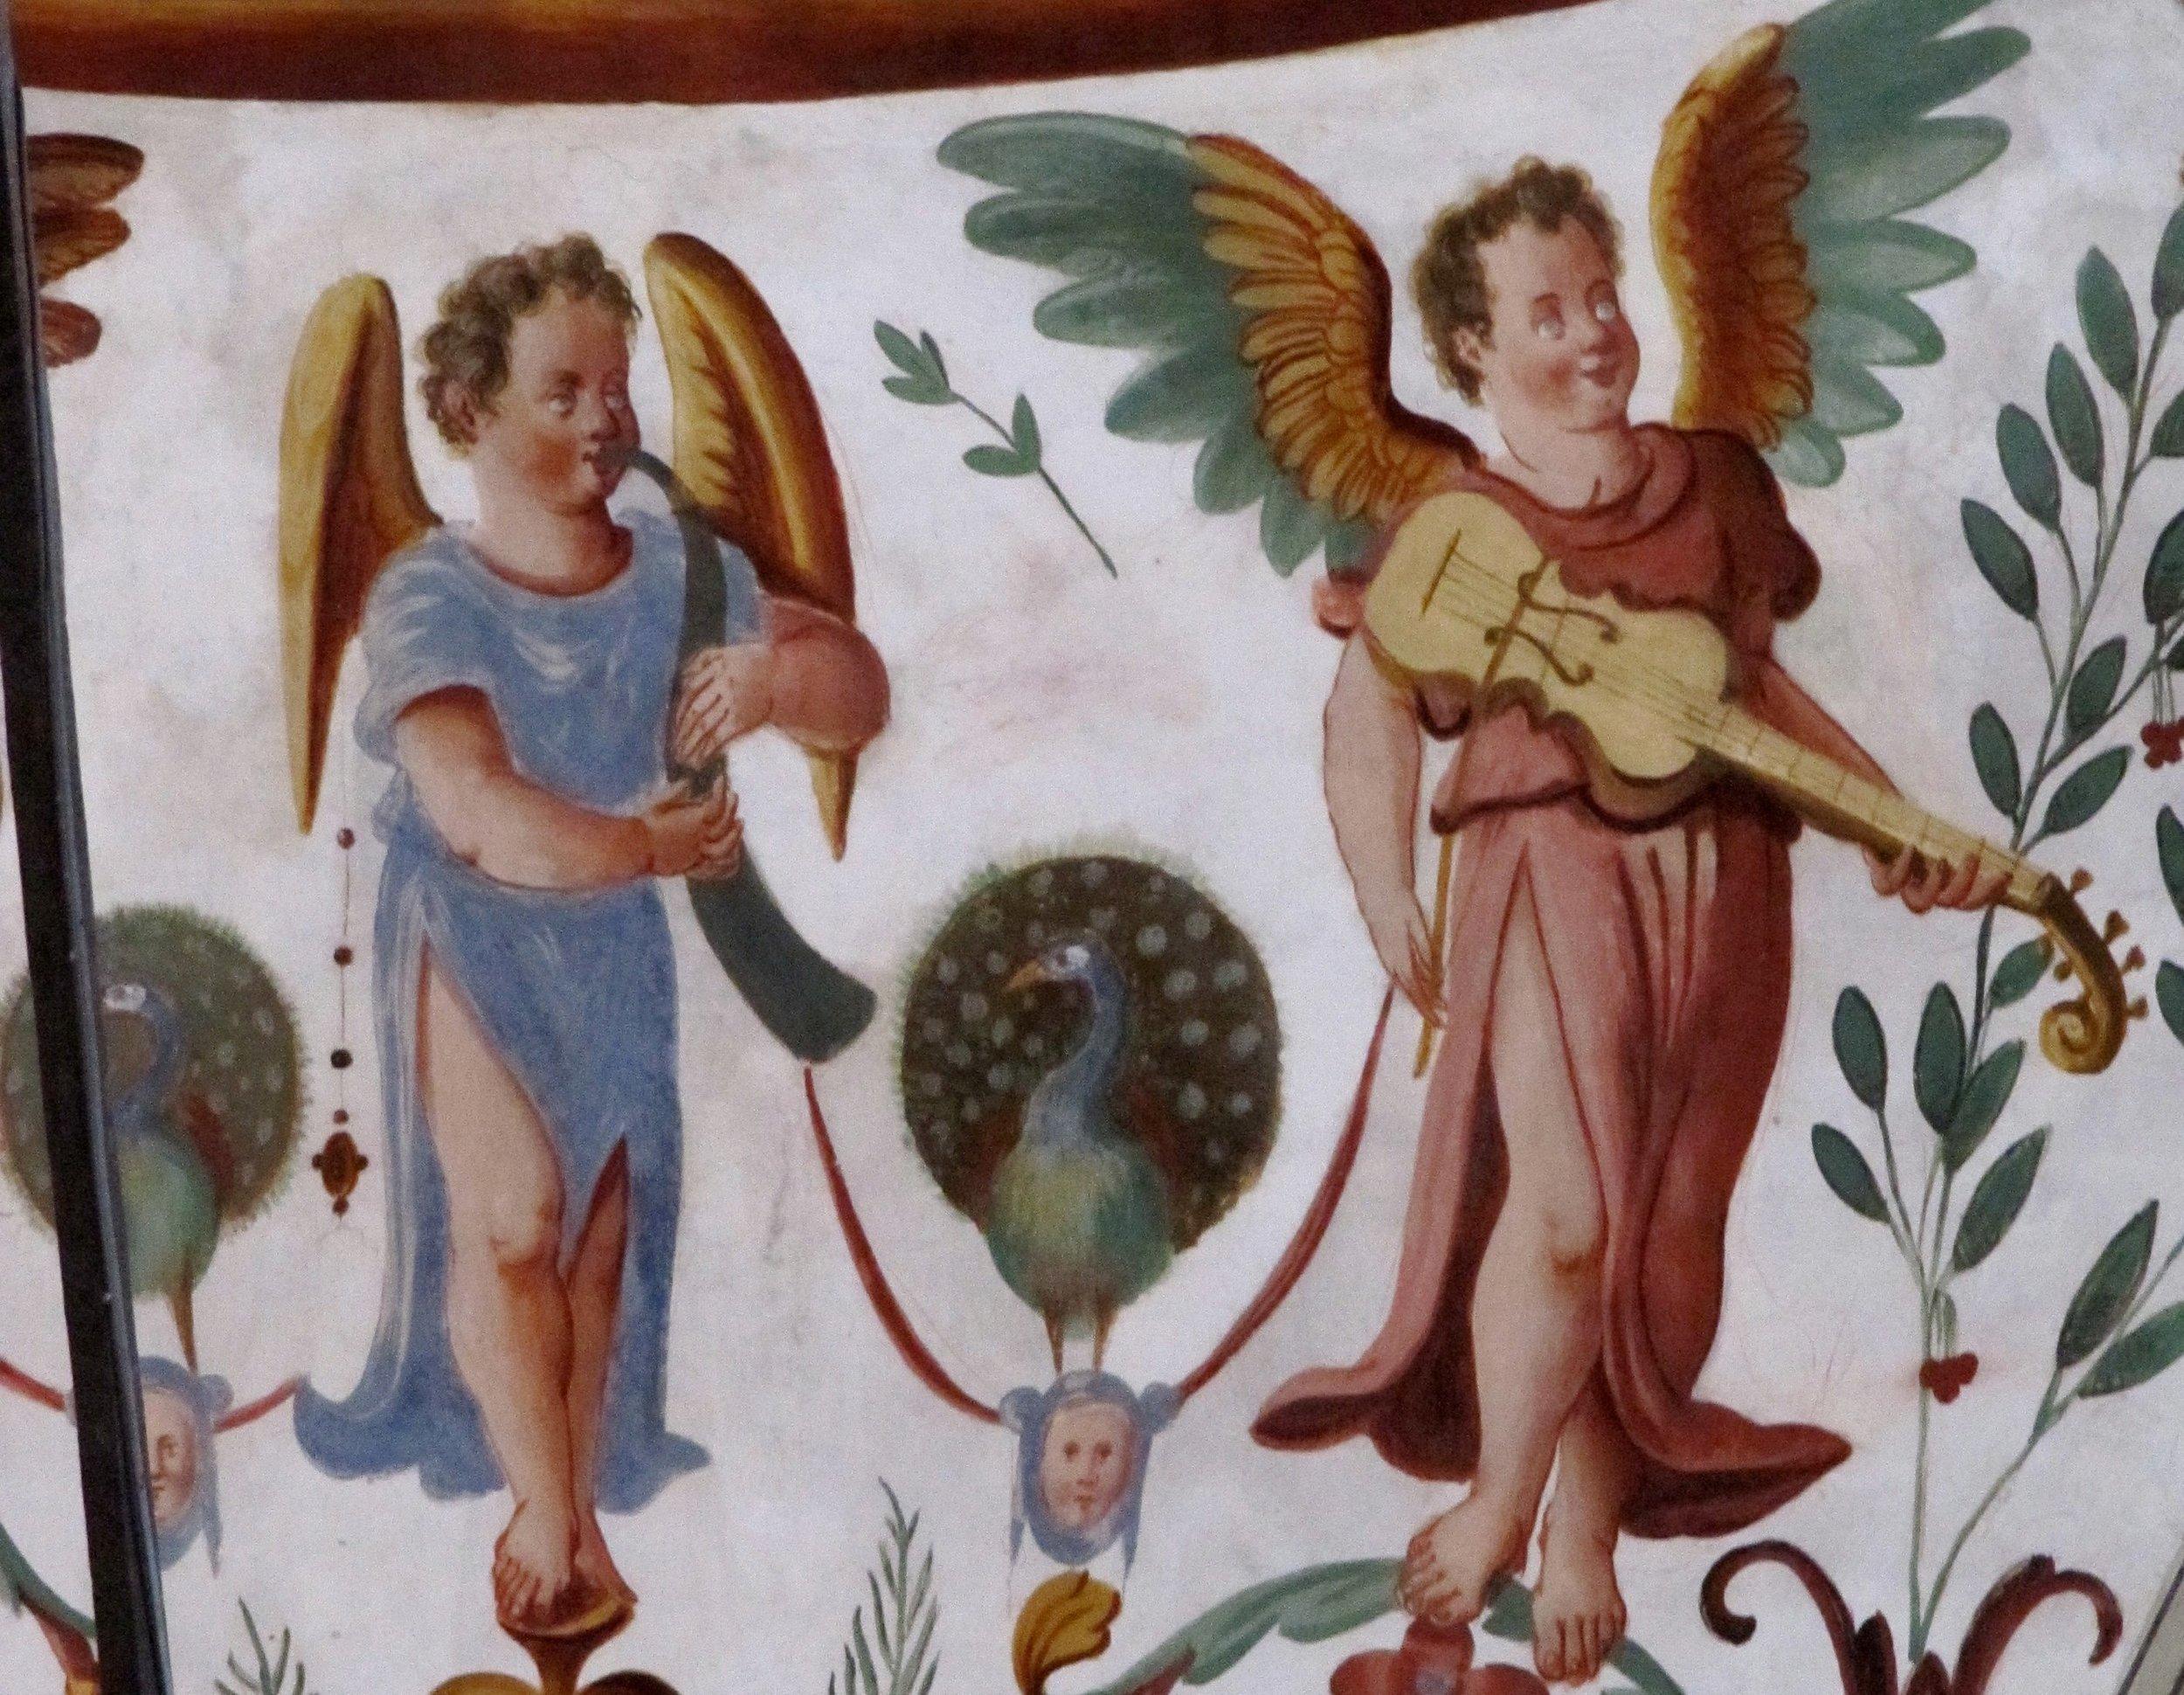 Fresco in the Sacristy of the Church S. Pietro in Ciel d'Oro, Pavia.